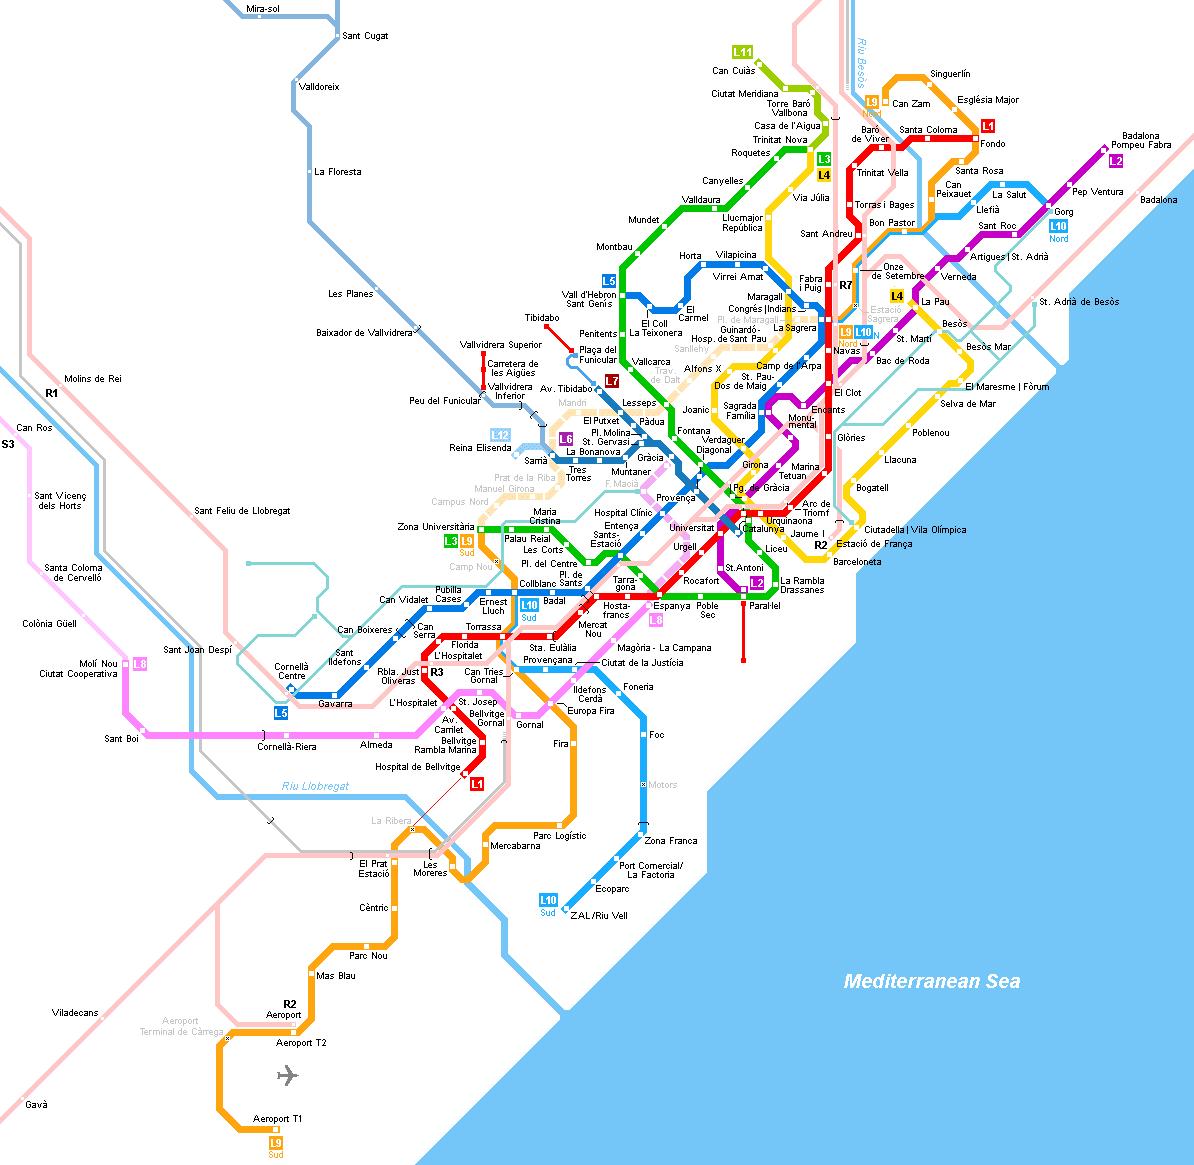 "Barcelona Metro Map UrbanRail.> Europe > Spain > Catalonia > Barcelona Metro Barcelona Metro Map"" title=""Barcelona Metro Map UrbanRail.> Europe > Spain > Catalonia > Barcelona Metro Barcelona Metro Map"" width=""200″ height=""200″> <img src="